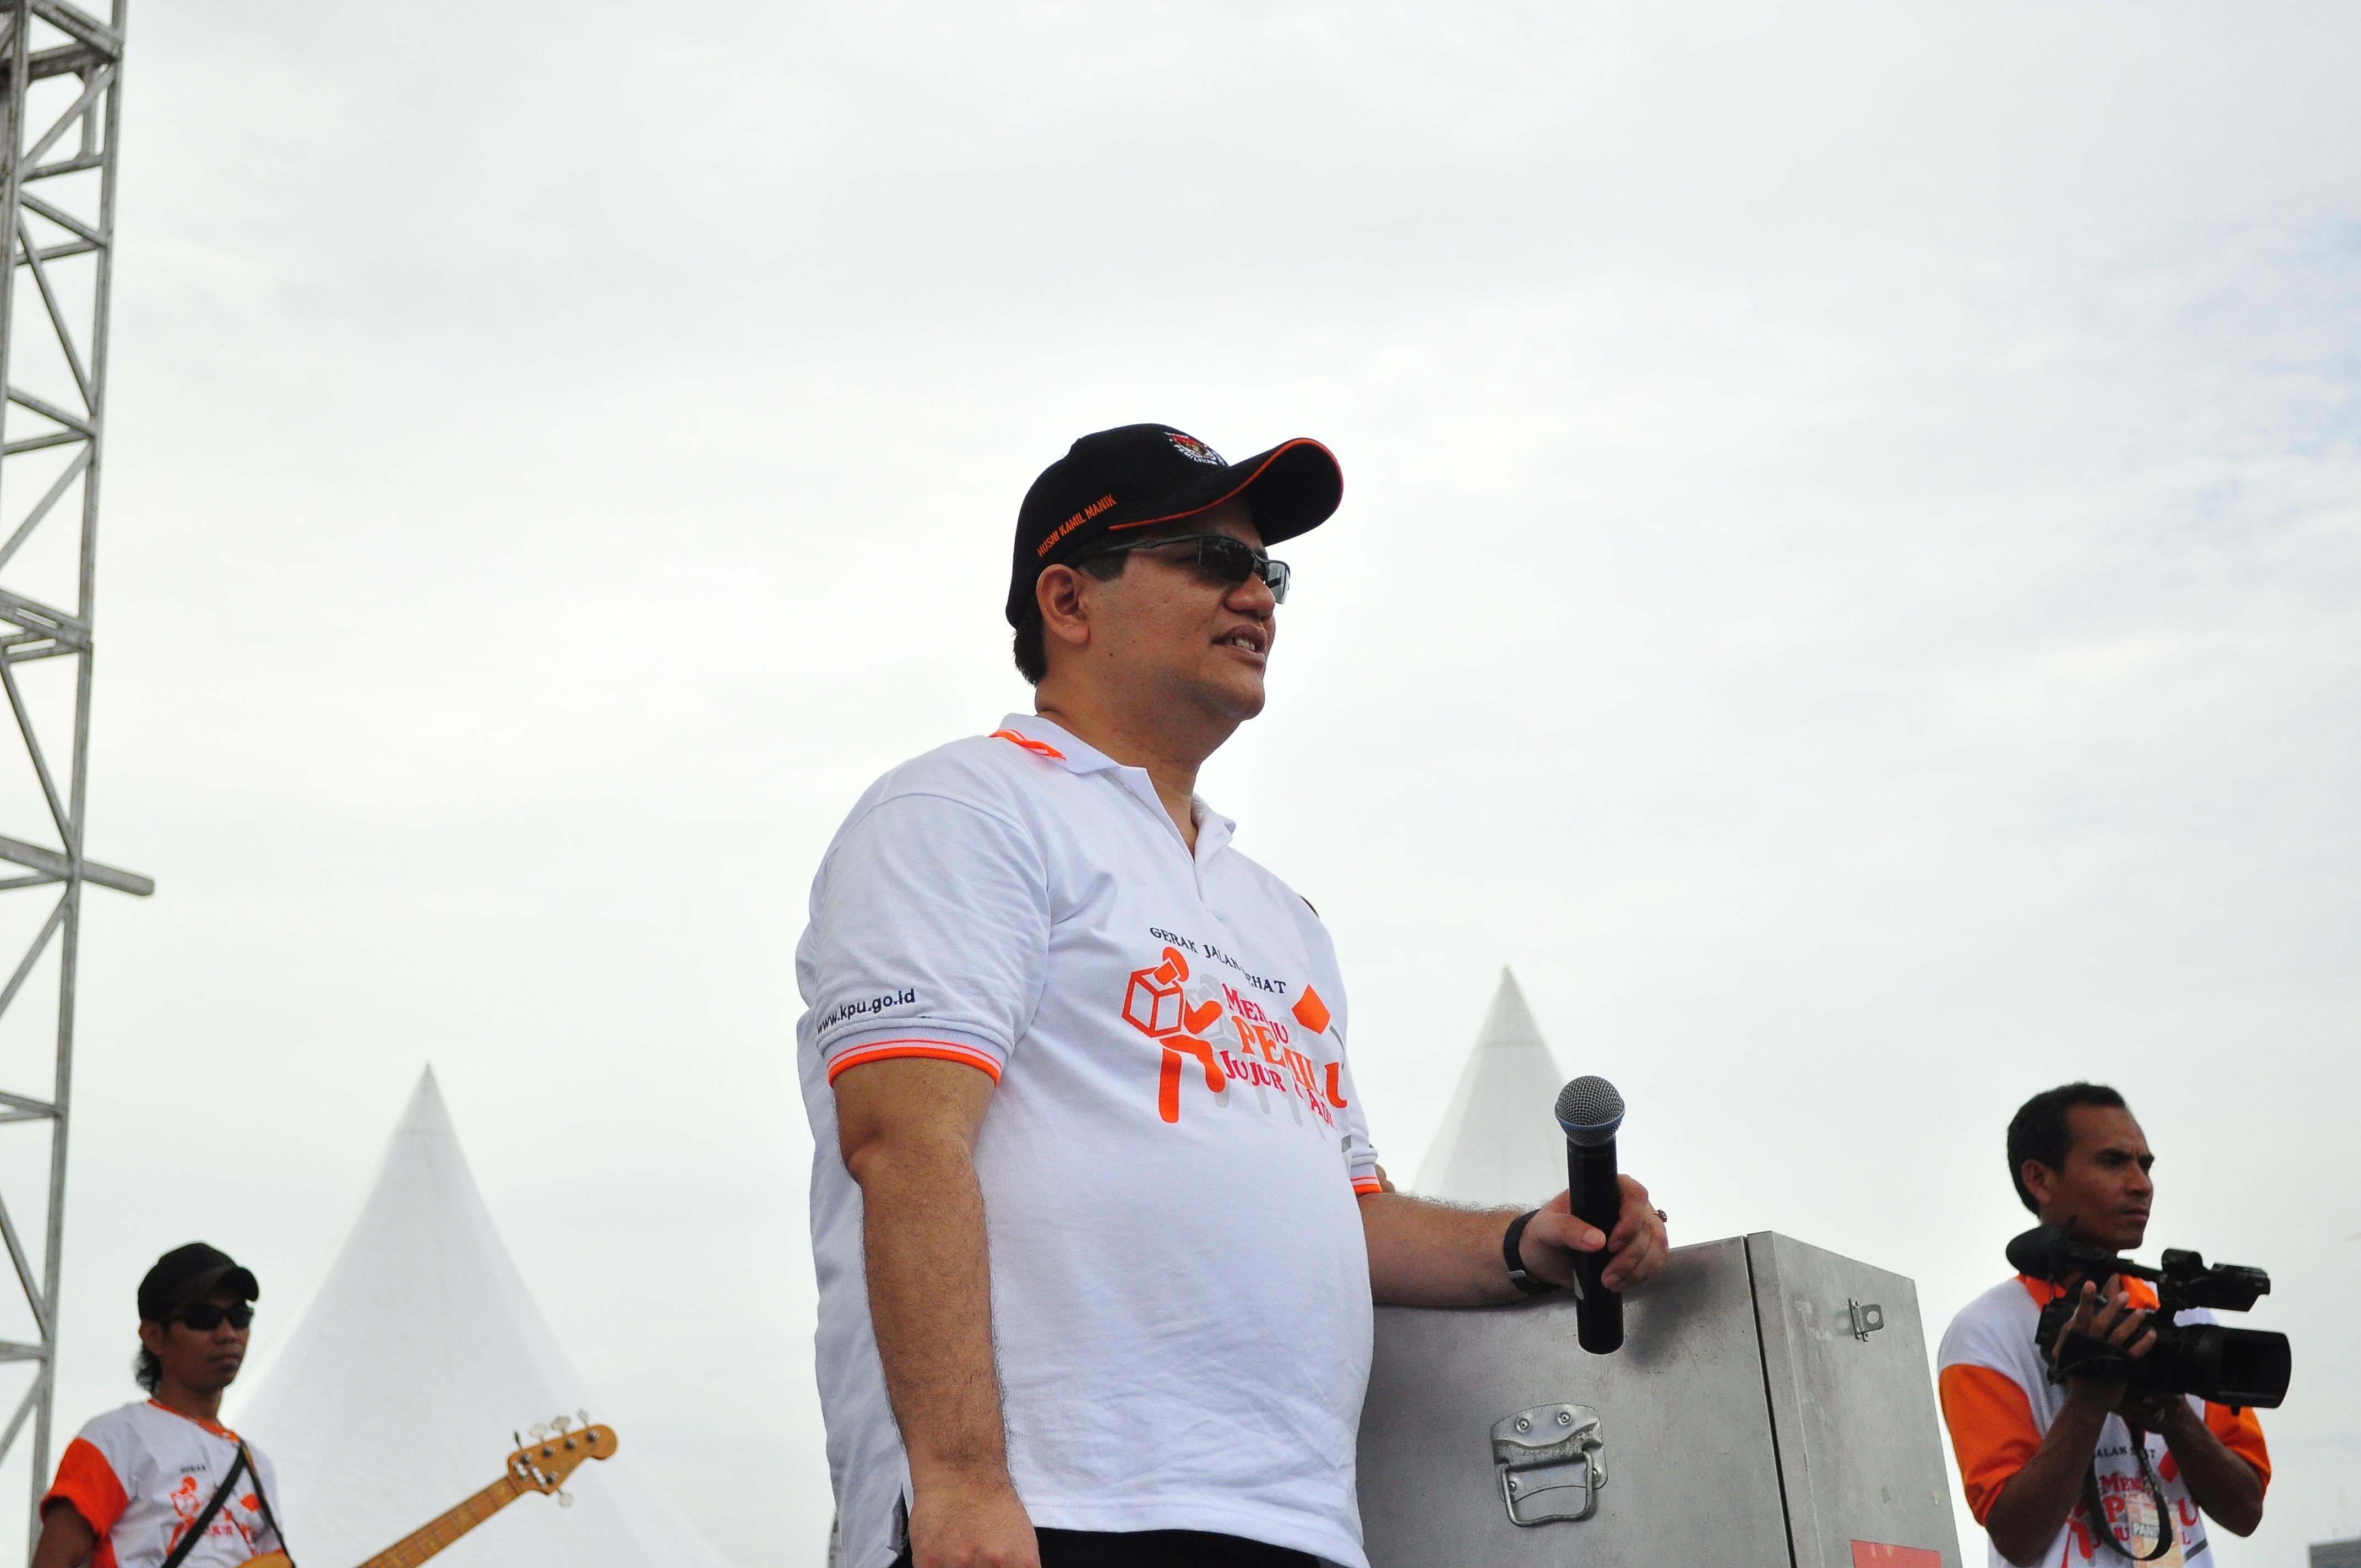 KPU Jalan Sehat – April 2013